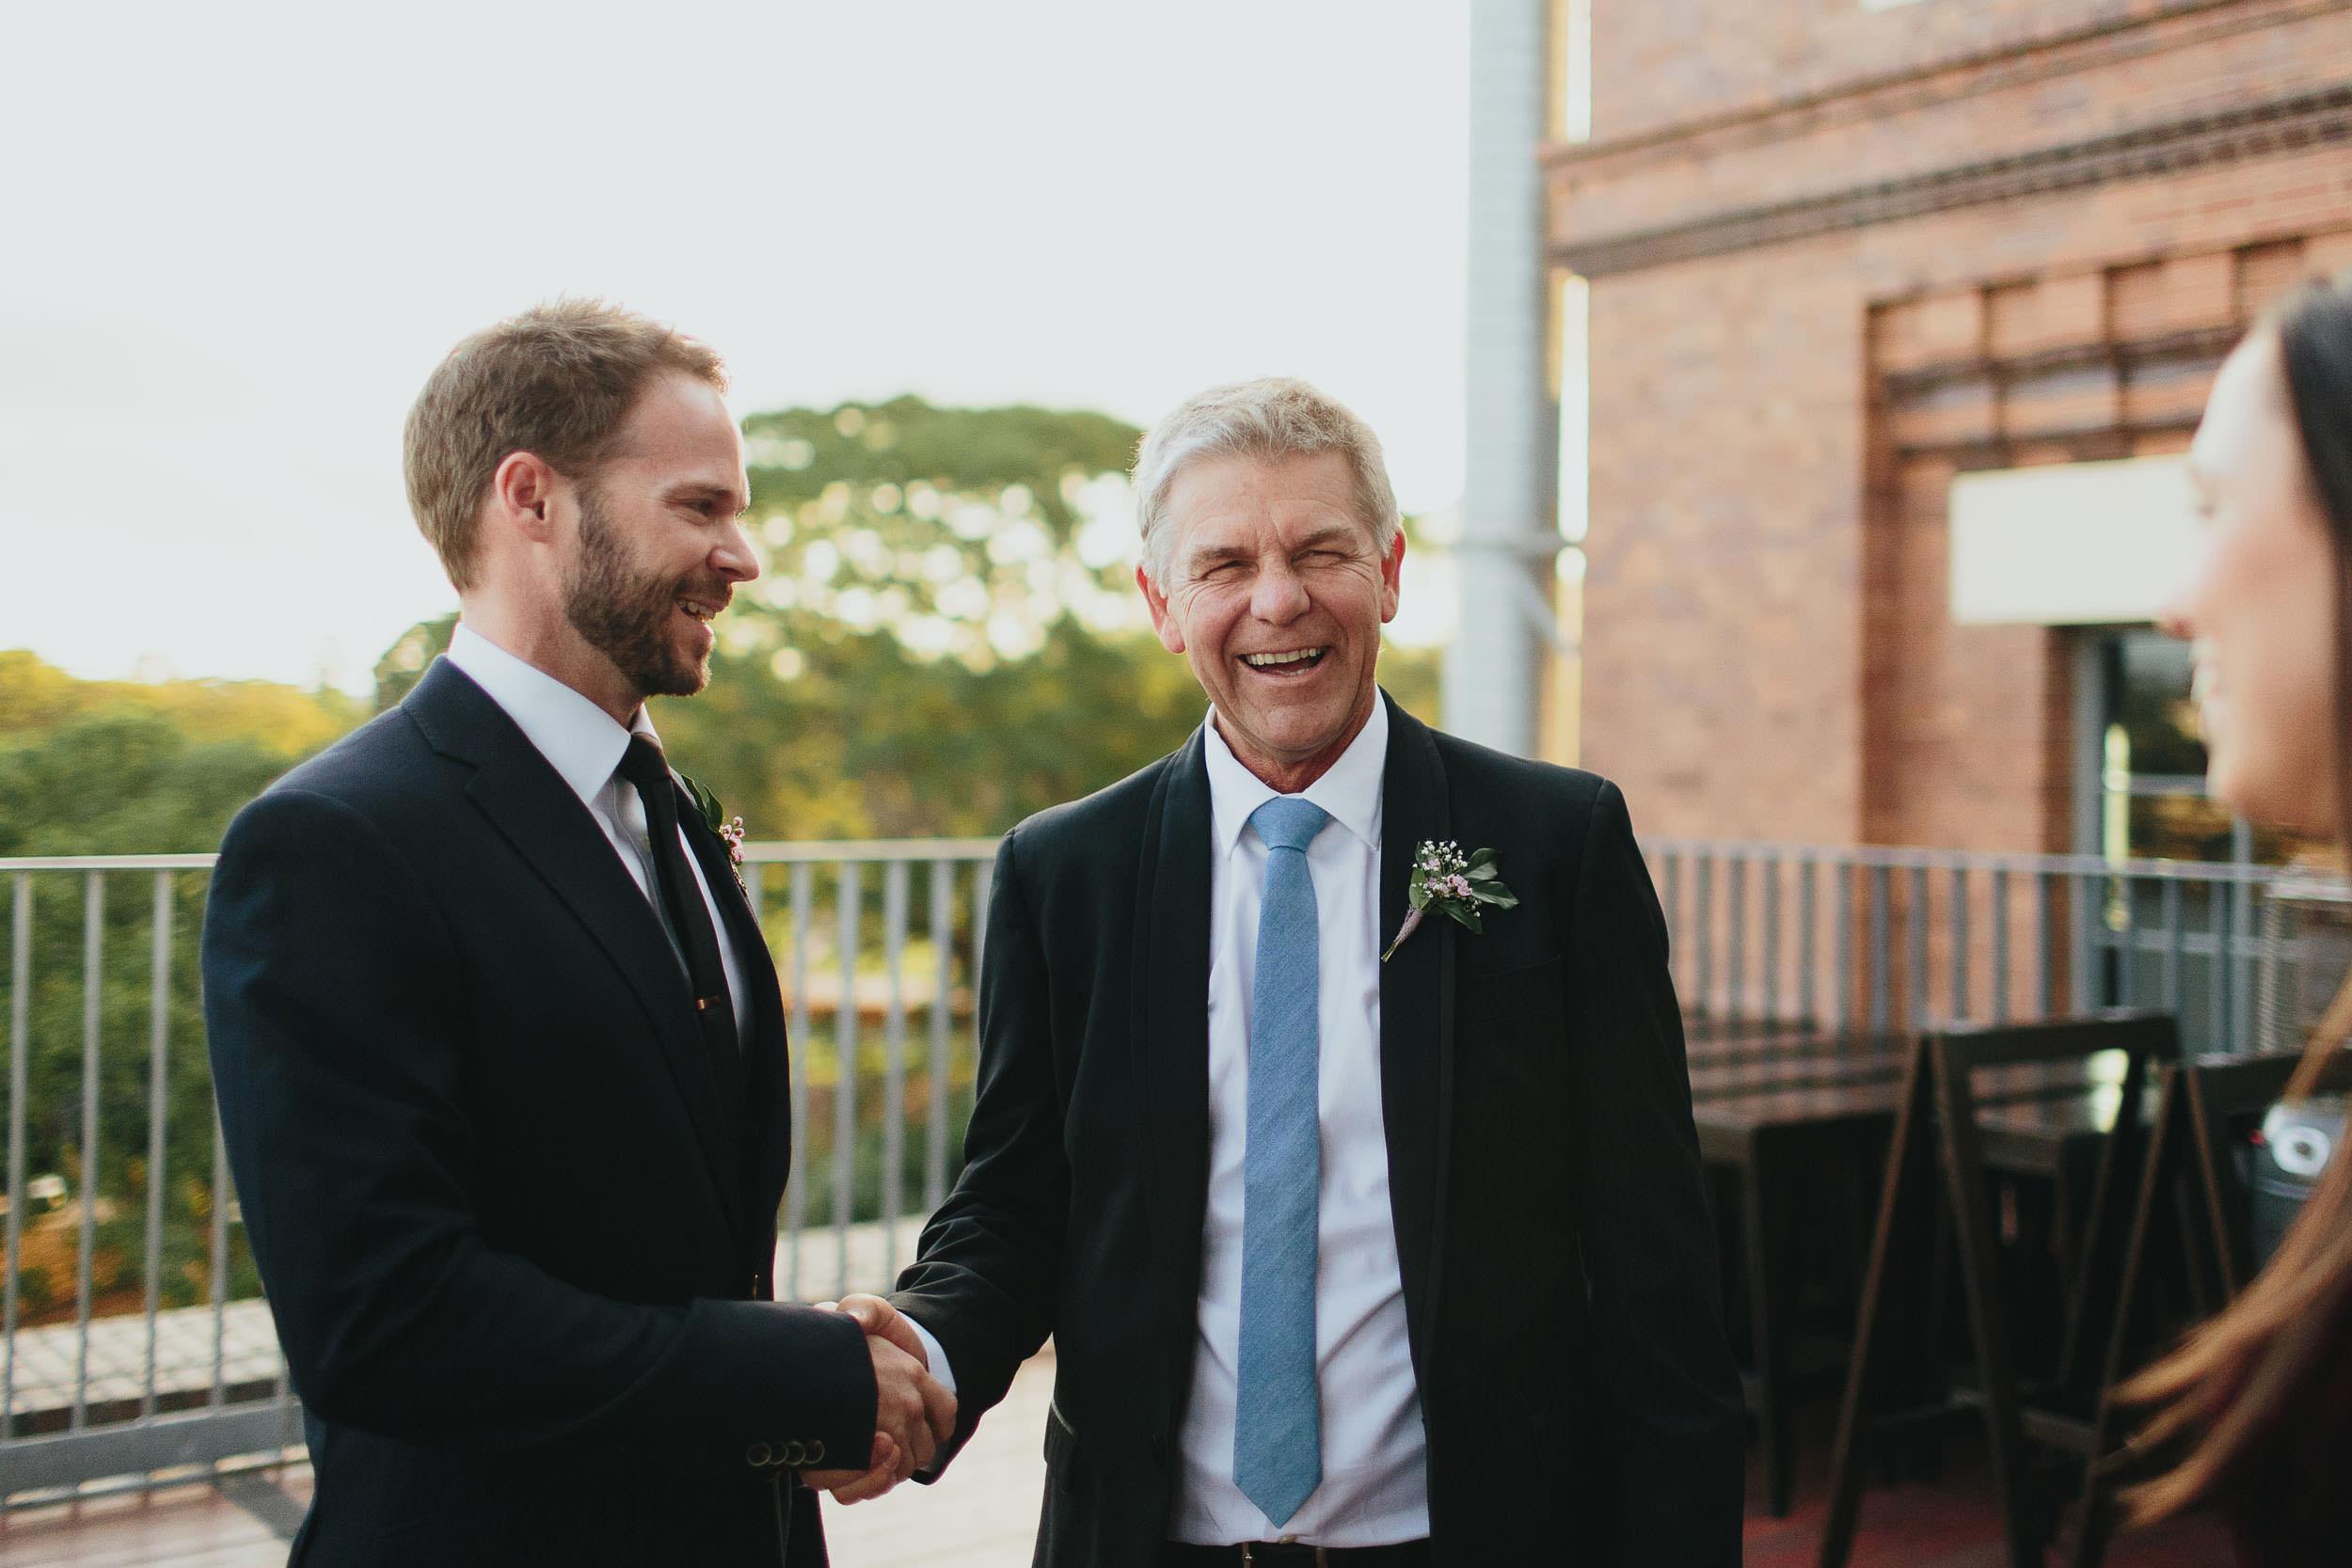 085_power_house_wedding_finch_and_oak.jpg